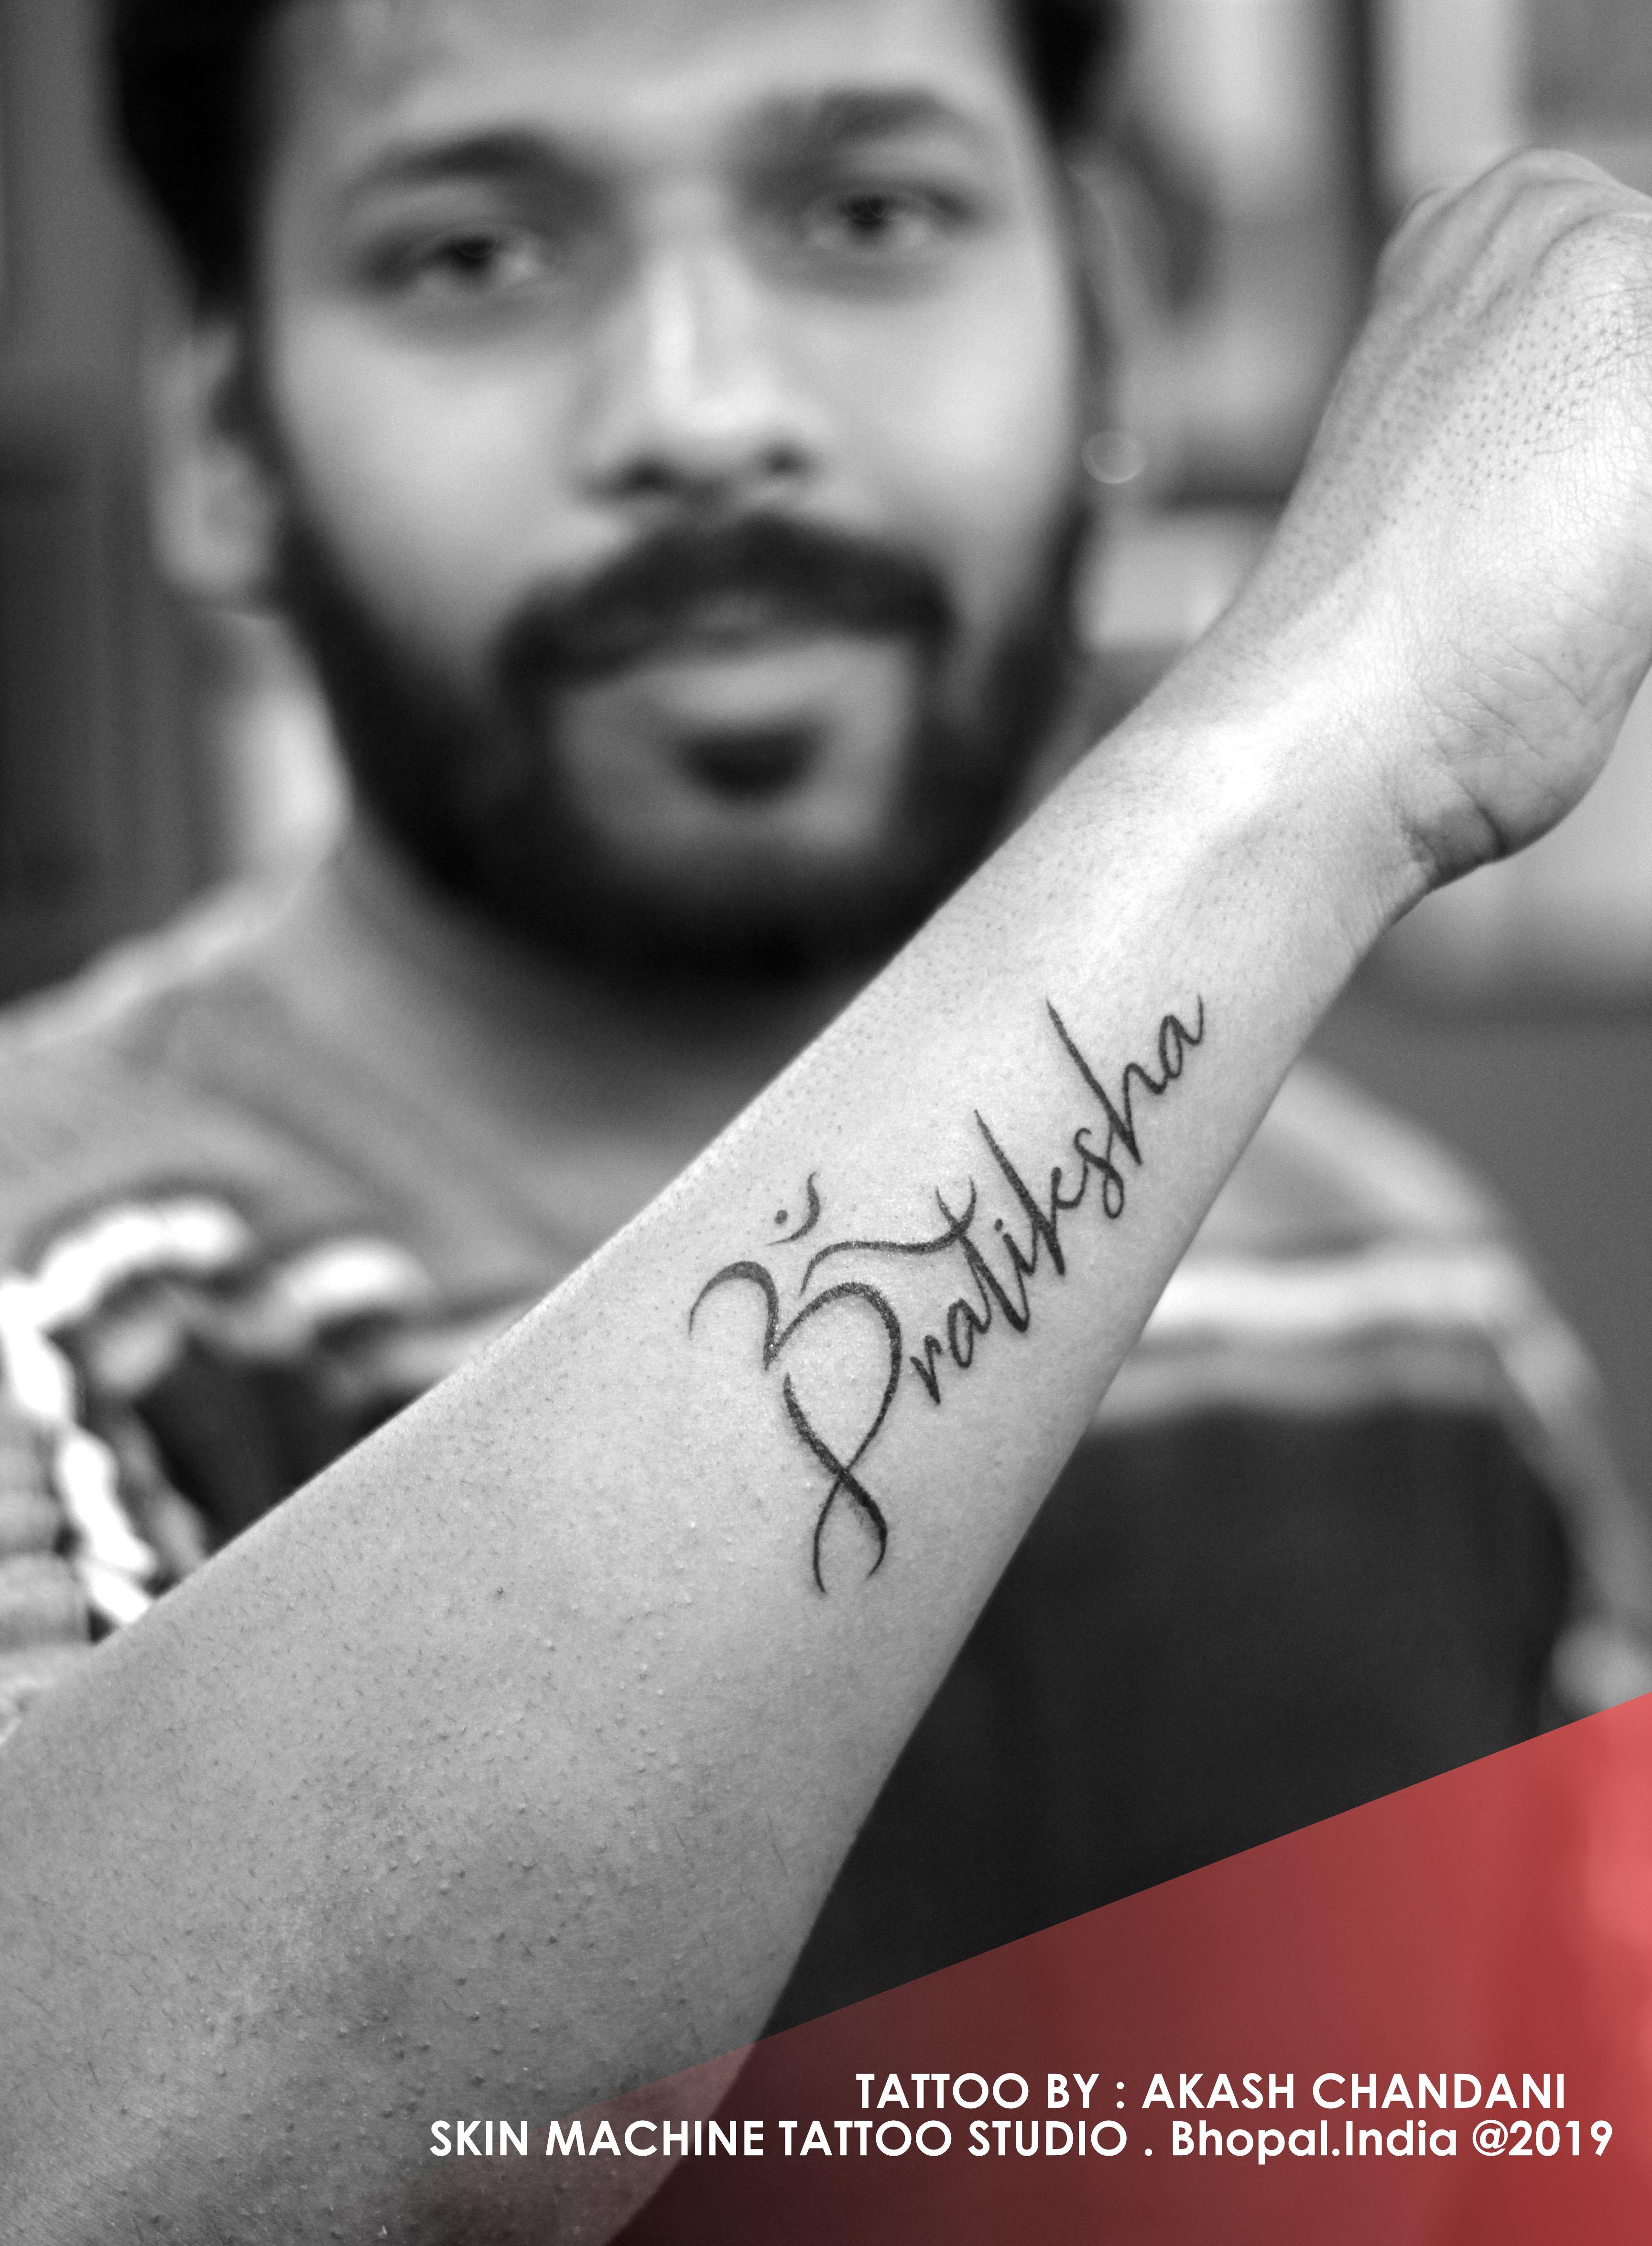 Om With Name Pratiksha Designed By Akash Chandani Skin Machine Tattoo Studio Email For Appointmen Name Tattoo Designs Om Tattoo Design Name Tattoos On Wrist